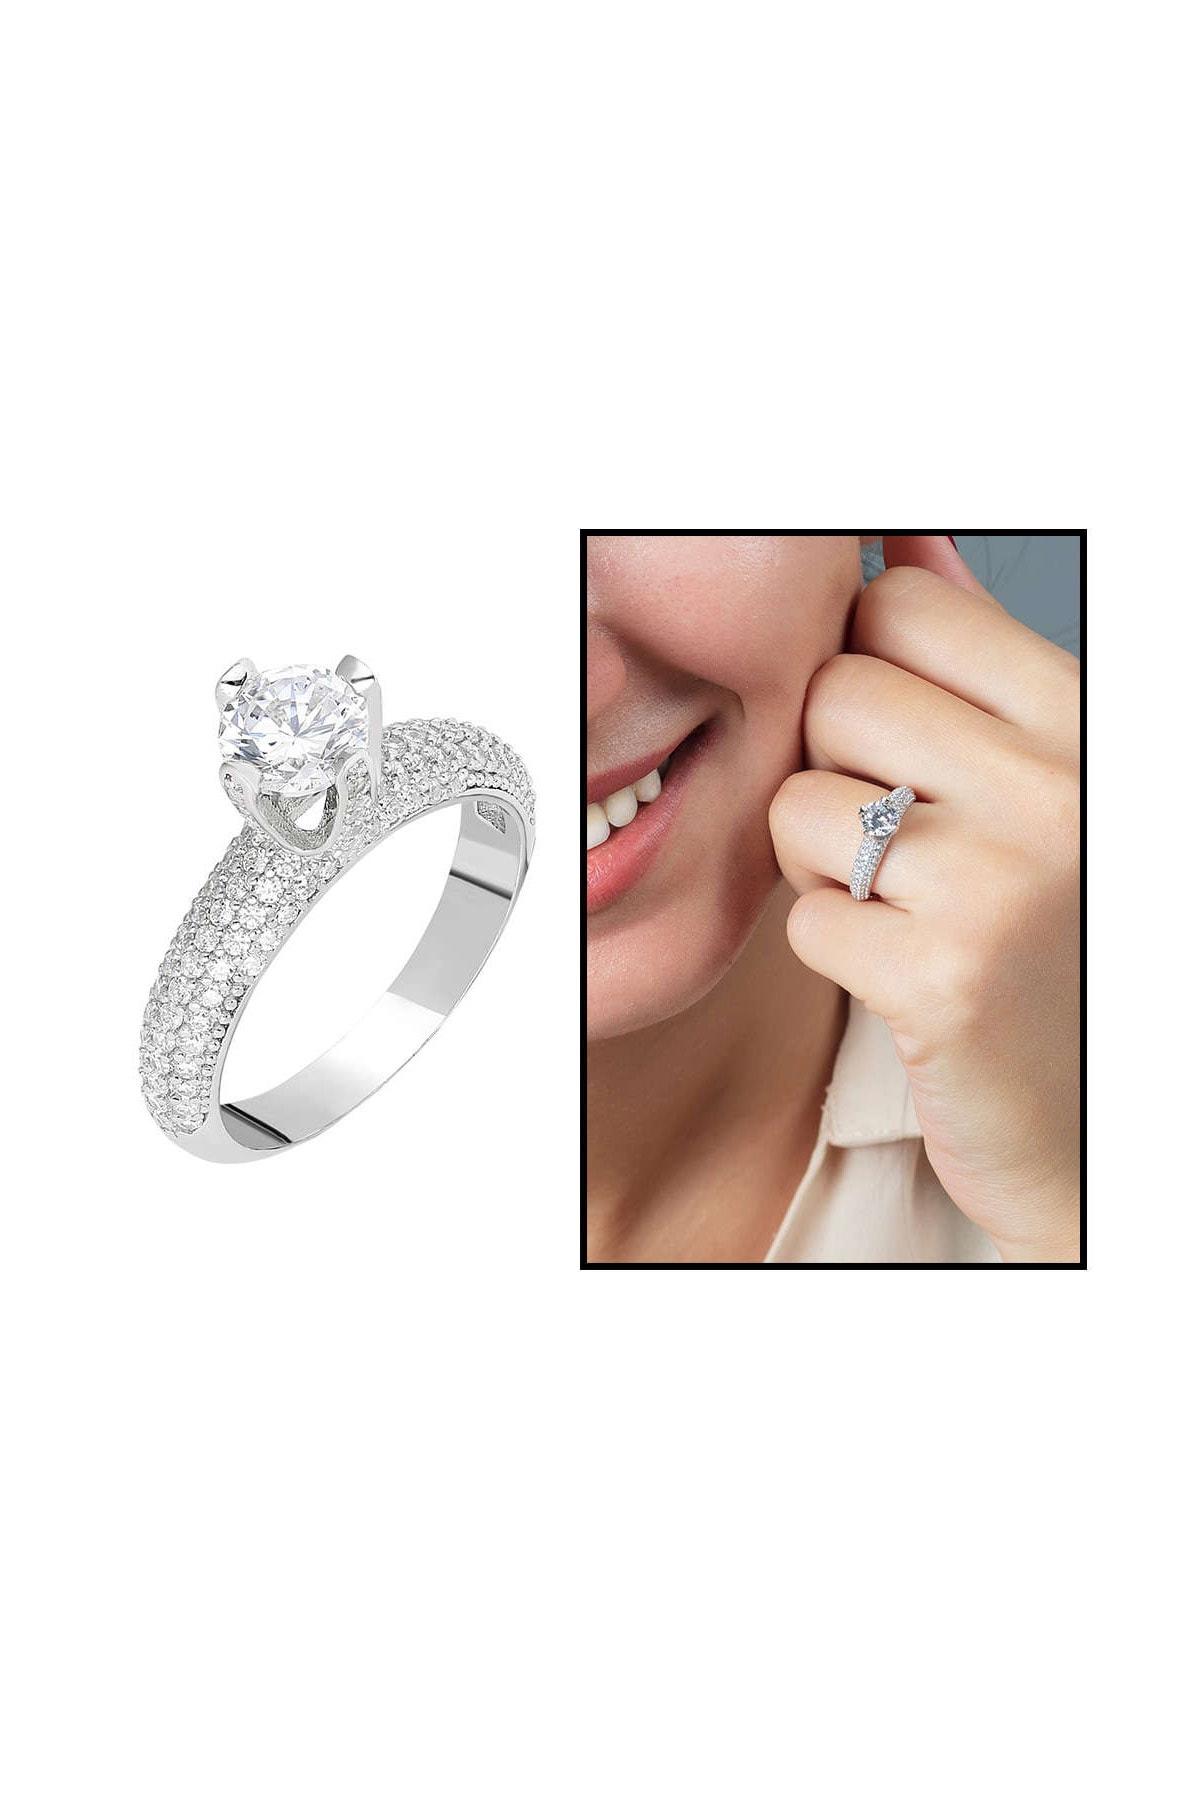 Tesbihane Starlight Diamond Pırlanta Montür Aşk Temalı 925 Ayar Gümüş Bayan Tektaş Yüzük 102001800 1